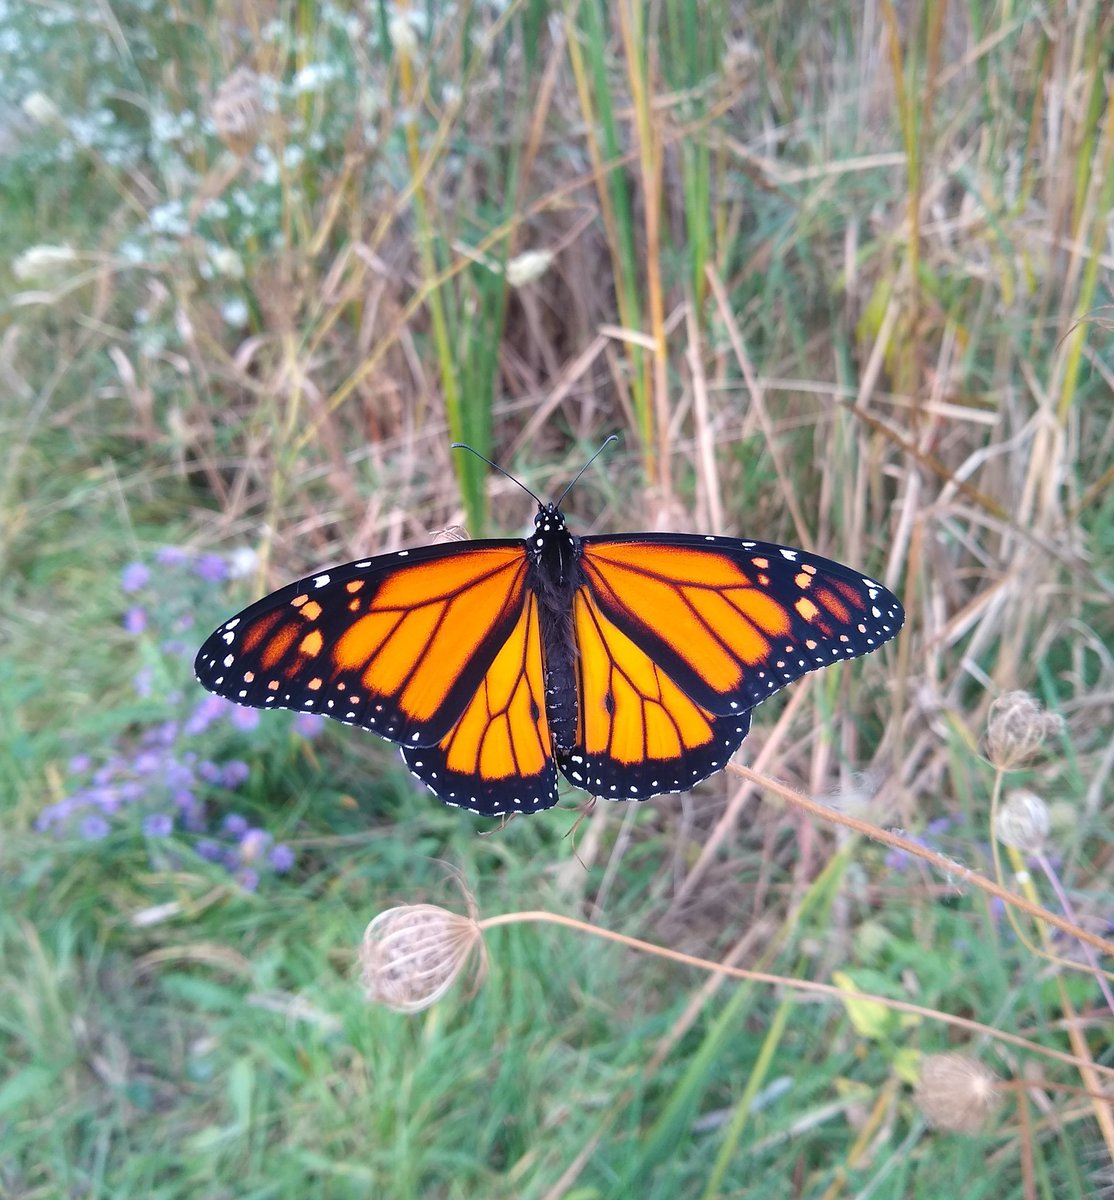 #monarch https://t.co/7yhIeDTpCH